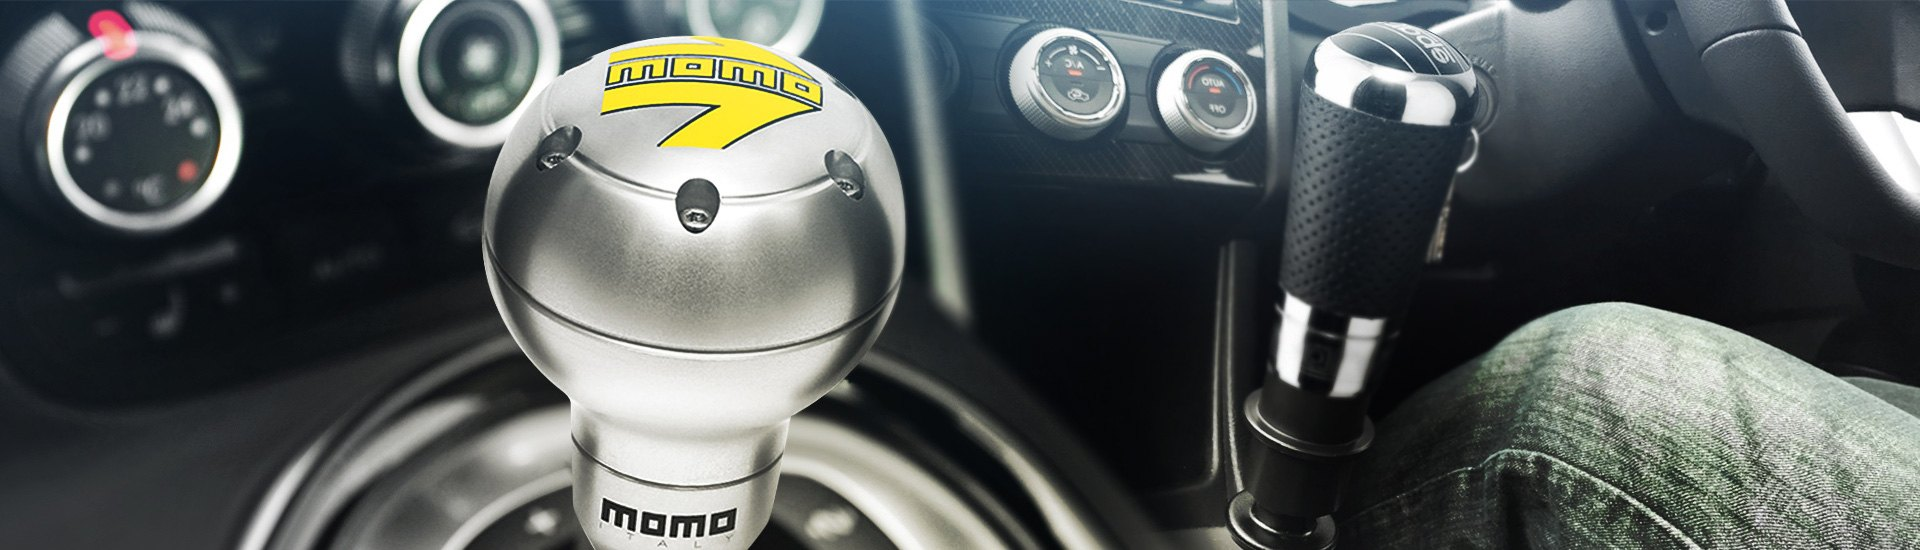 hight resolution of gear shift knobs